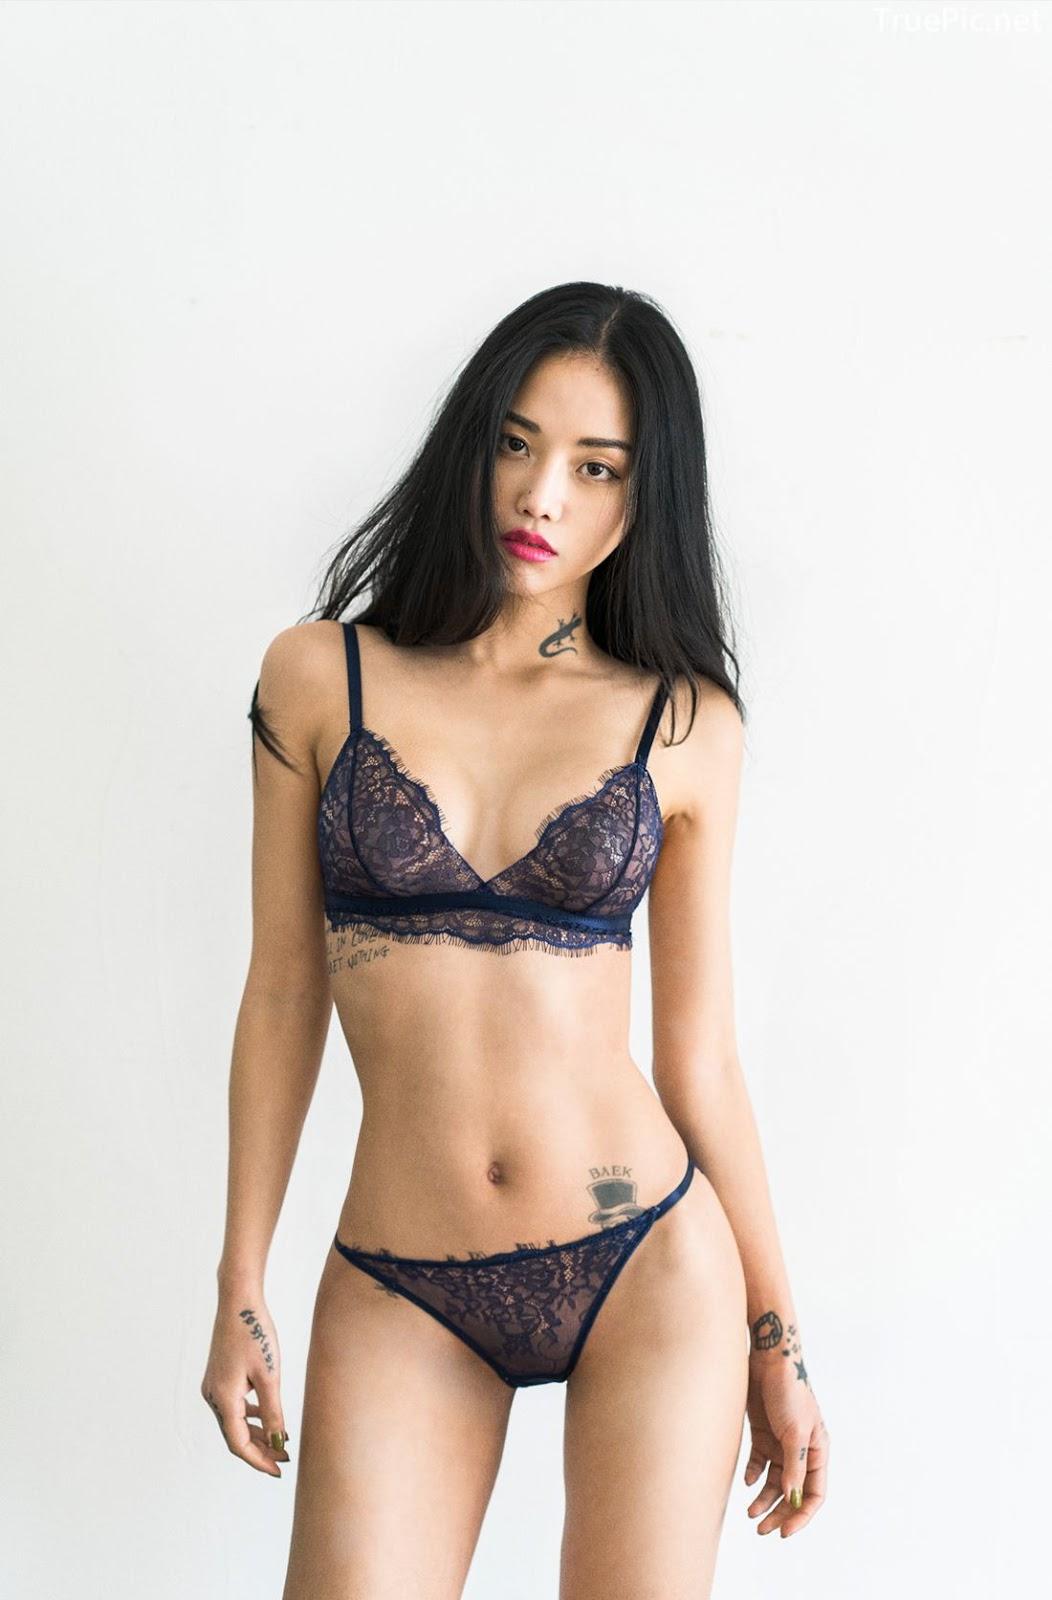 Korean Fashion Model - Baek Ye Jin - Sexy Lingerie Collection - TruePic.net - Picture 2